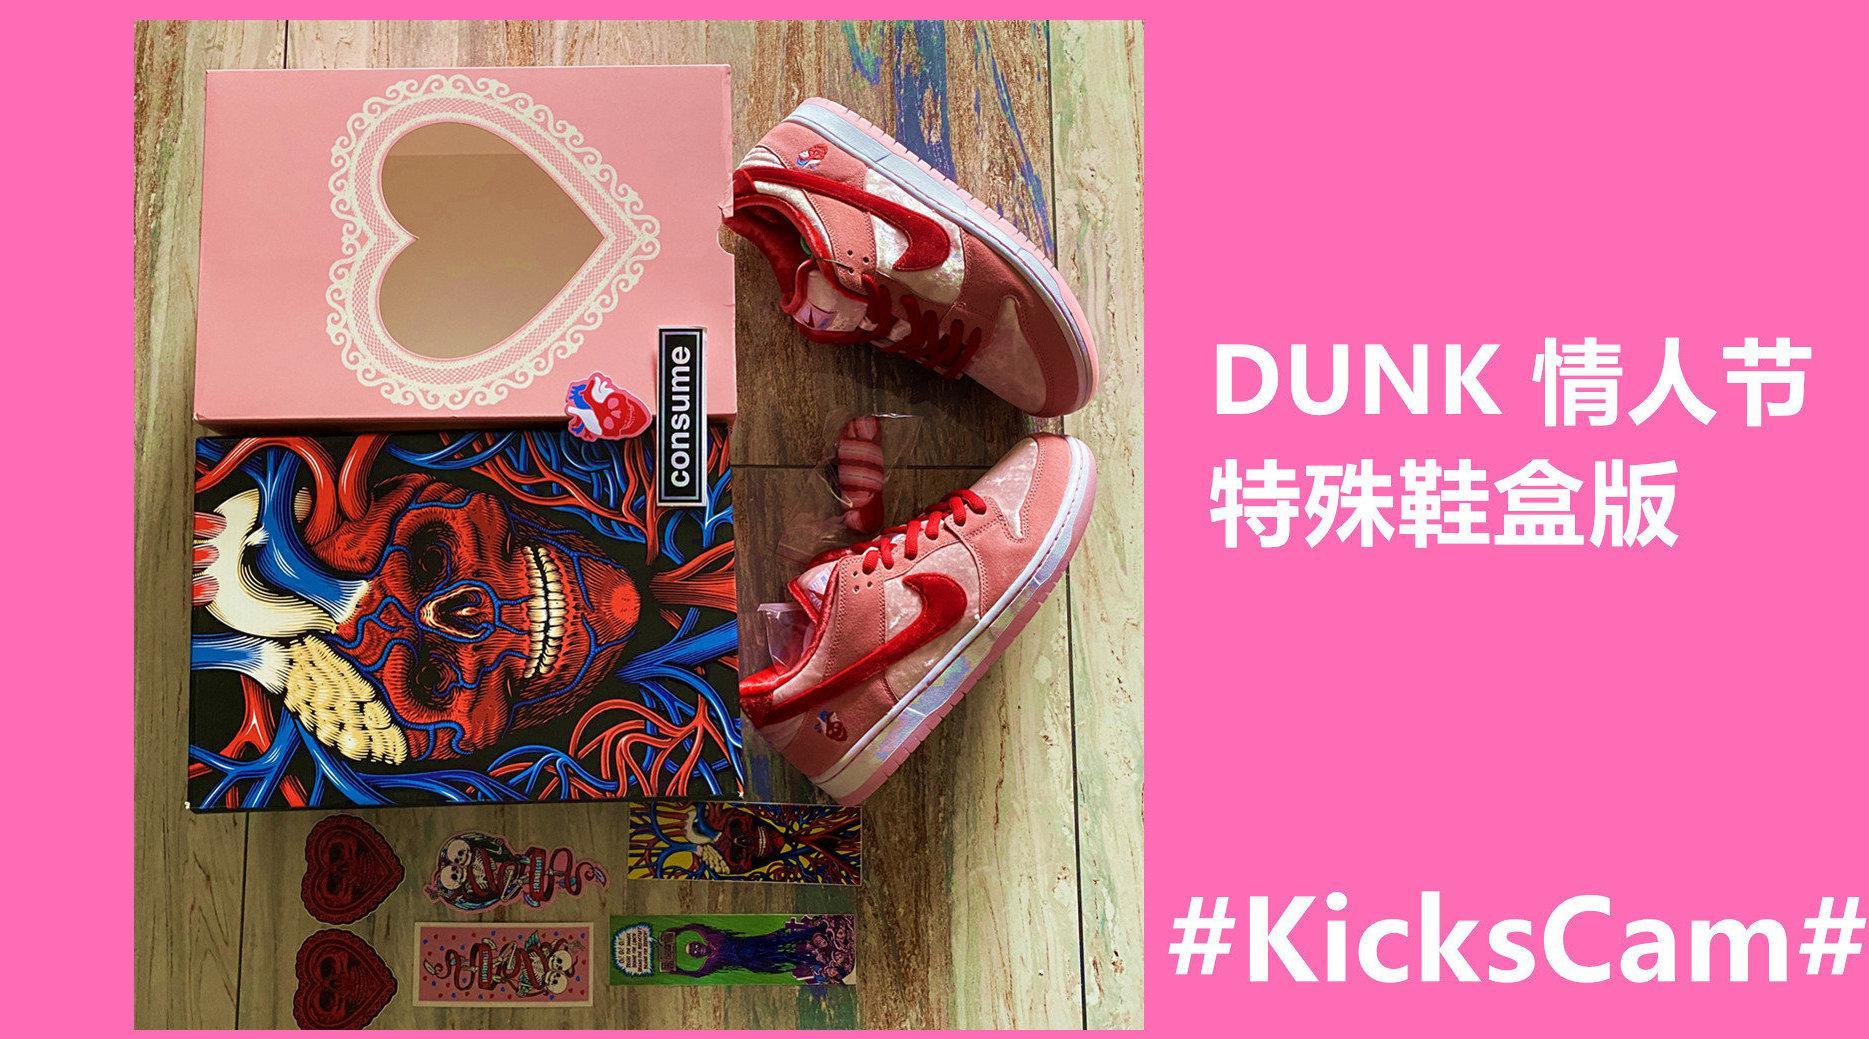 Nike情人节dunk开箱 存在两个版本的特殊鞋盒款?